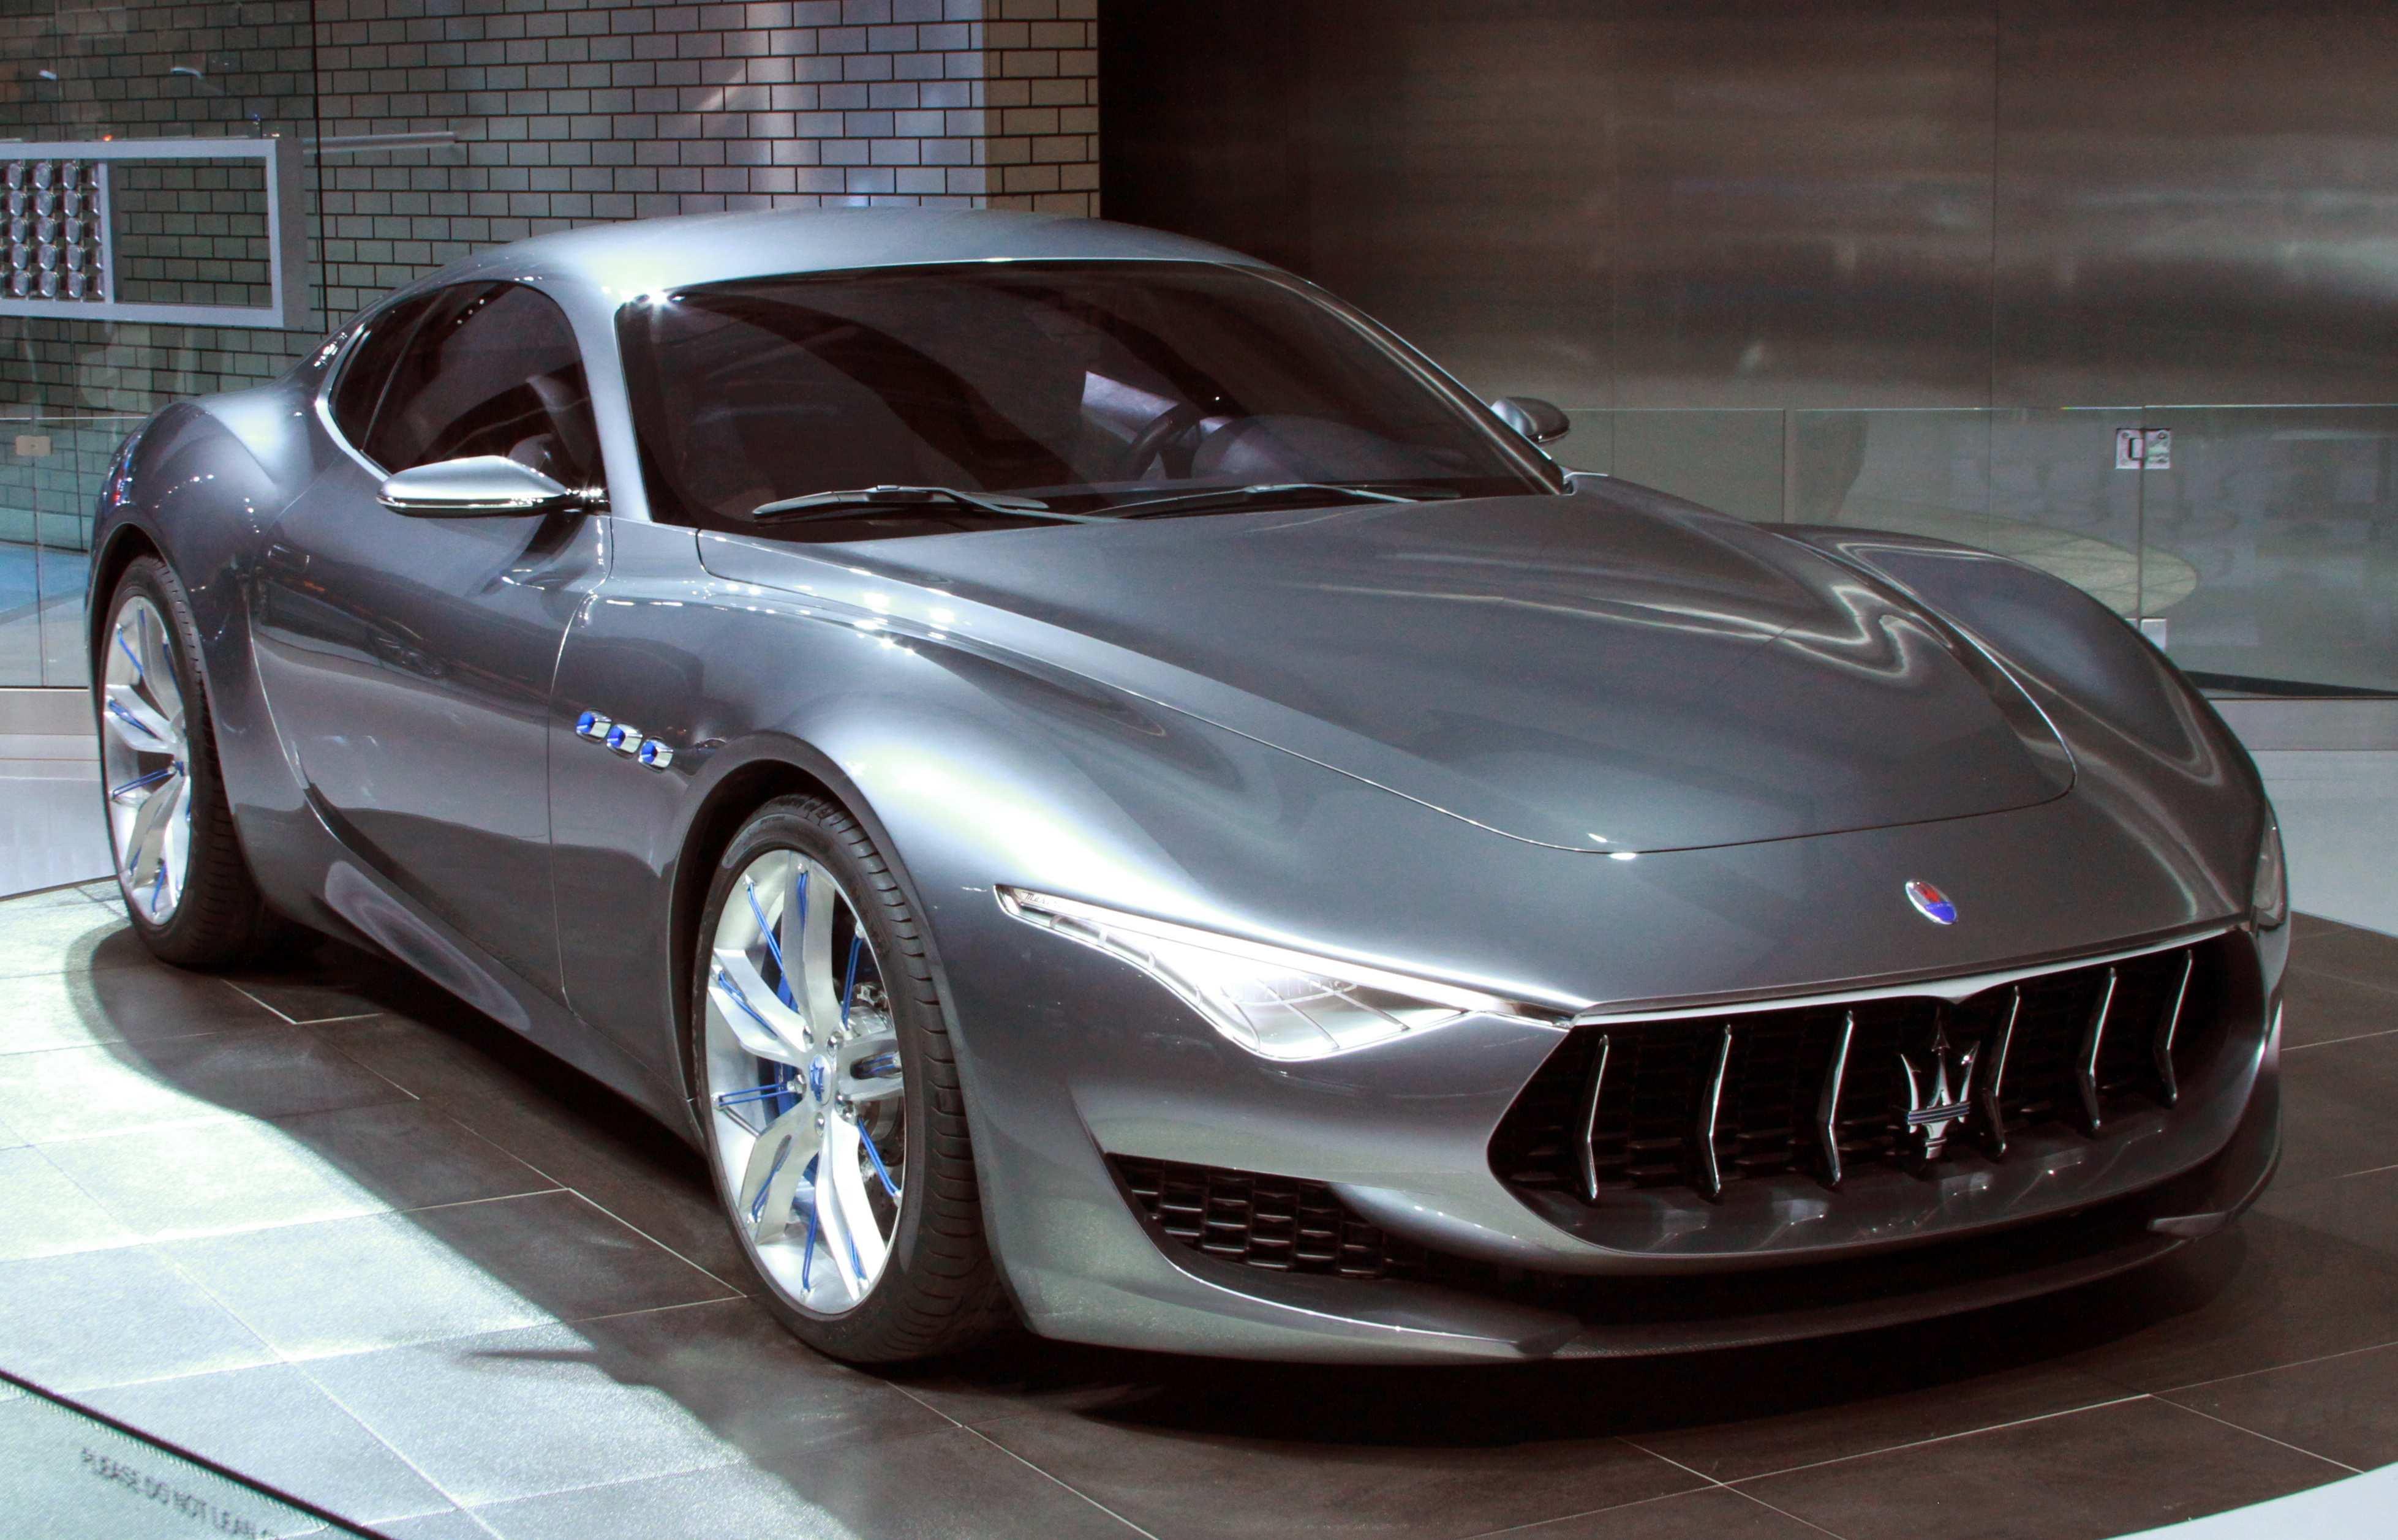 92 All New 2019 Maserati Alfieri Images by 2019 Maserati Alfieri